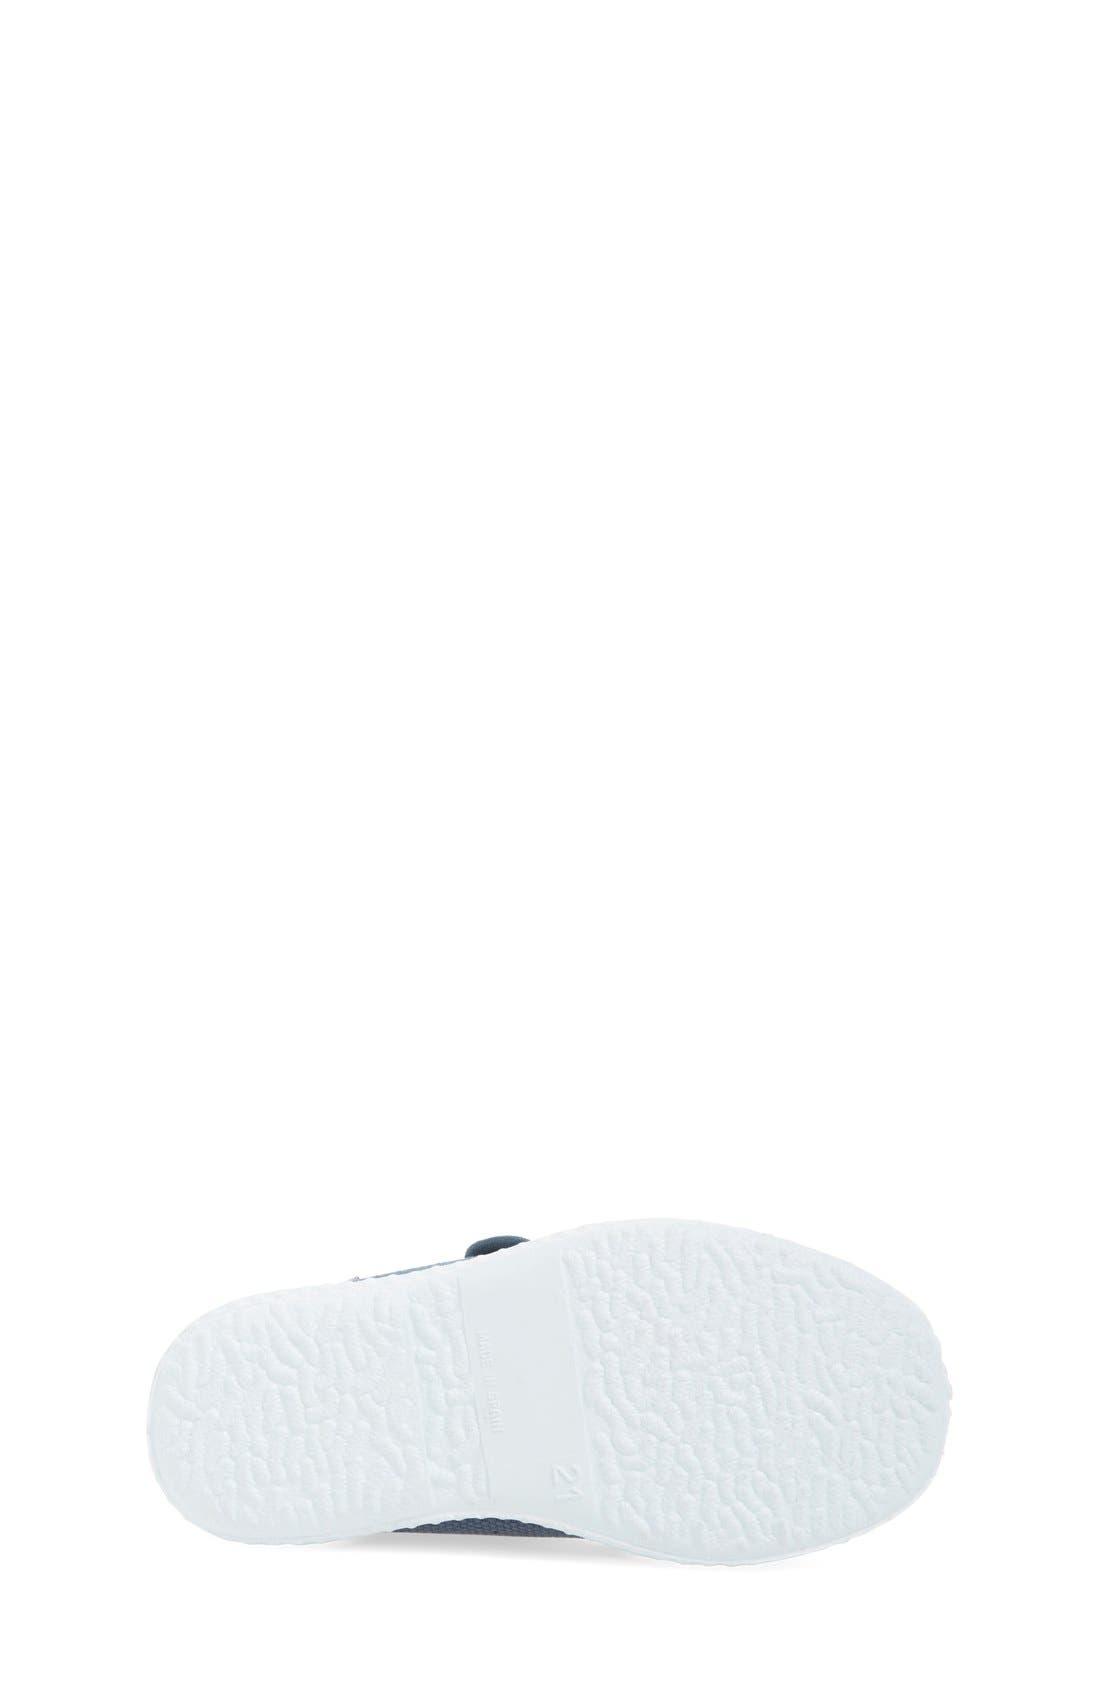 Canvas Sneaker,                             Alternate thumbnail 4, color,                             Grey